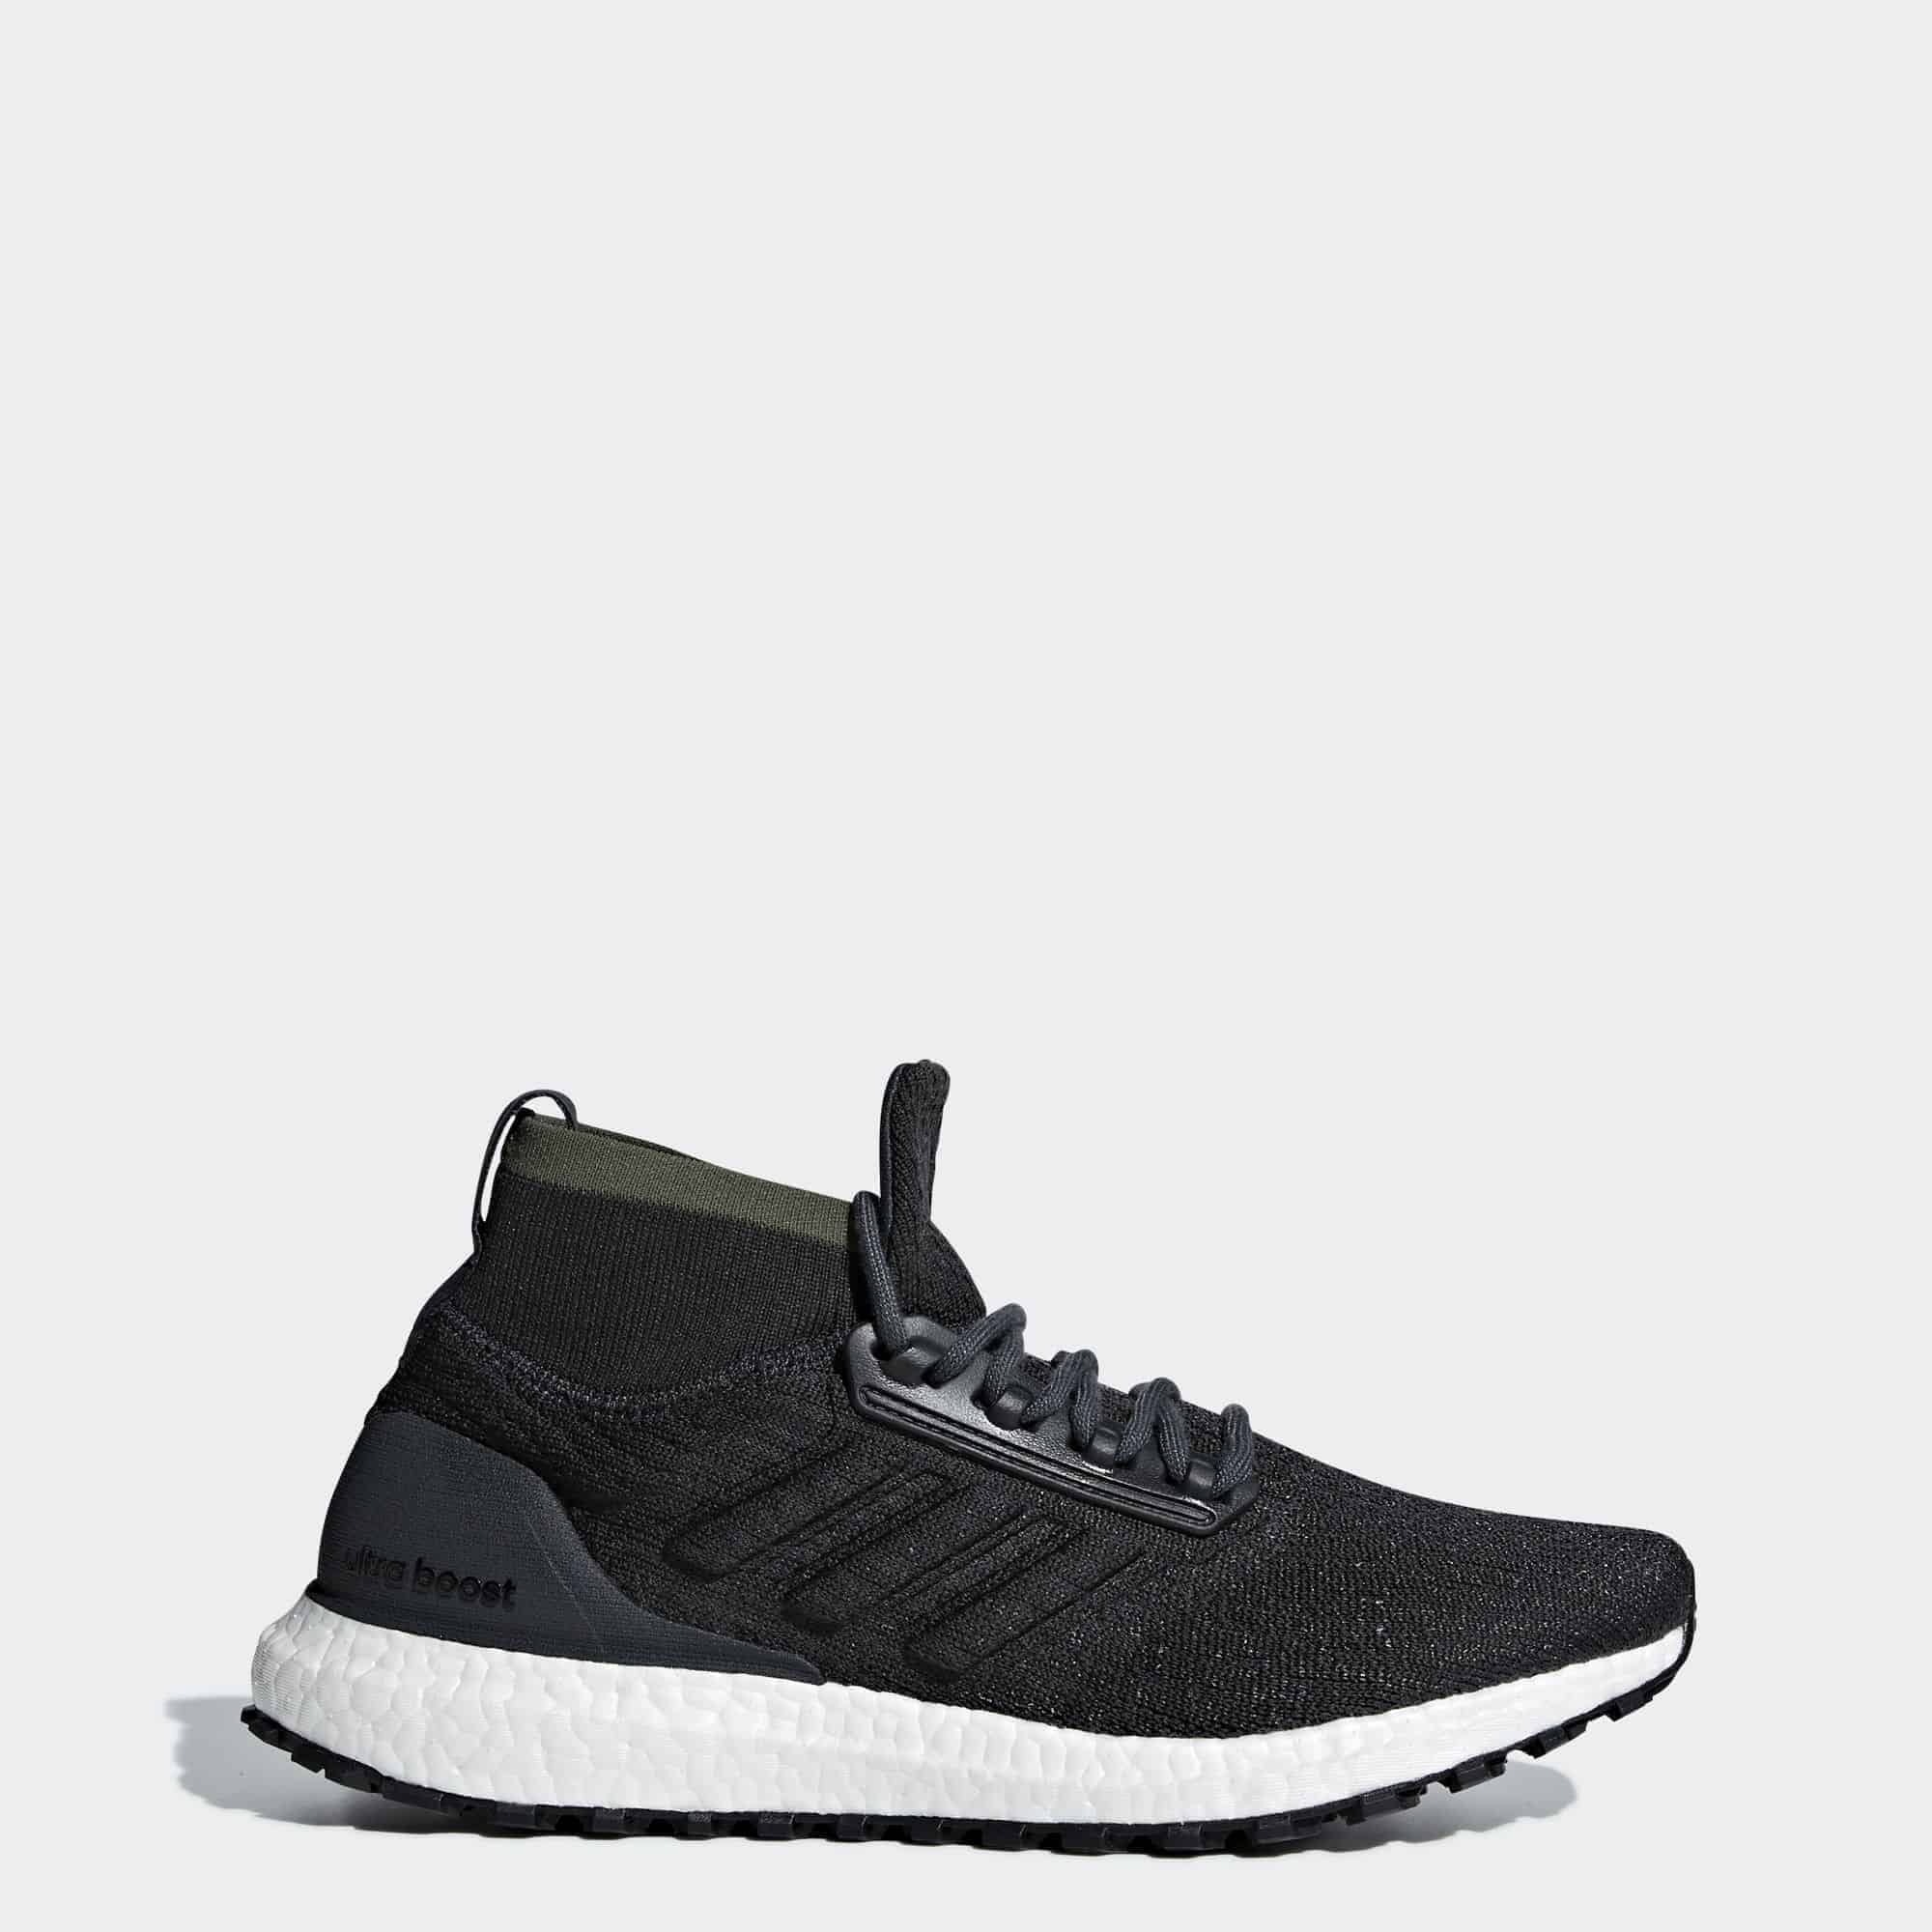 Кроссовки для бега Adidas Ultraboost All Terrain мужские